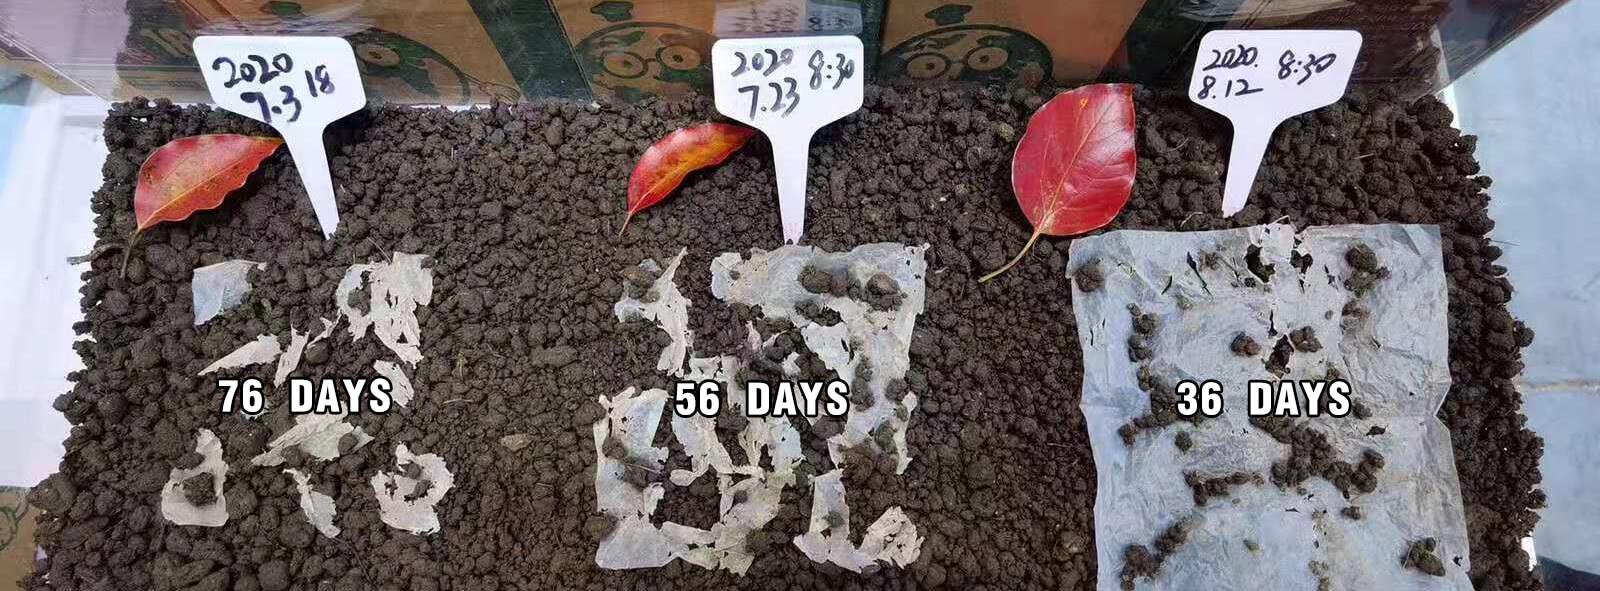 biodegradable days 5